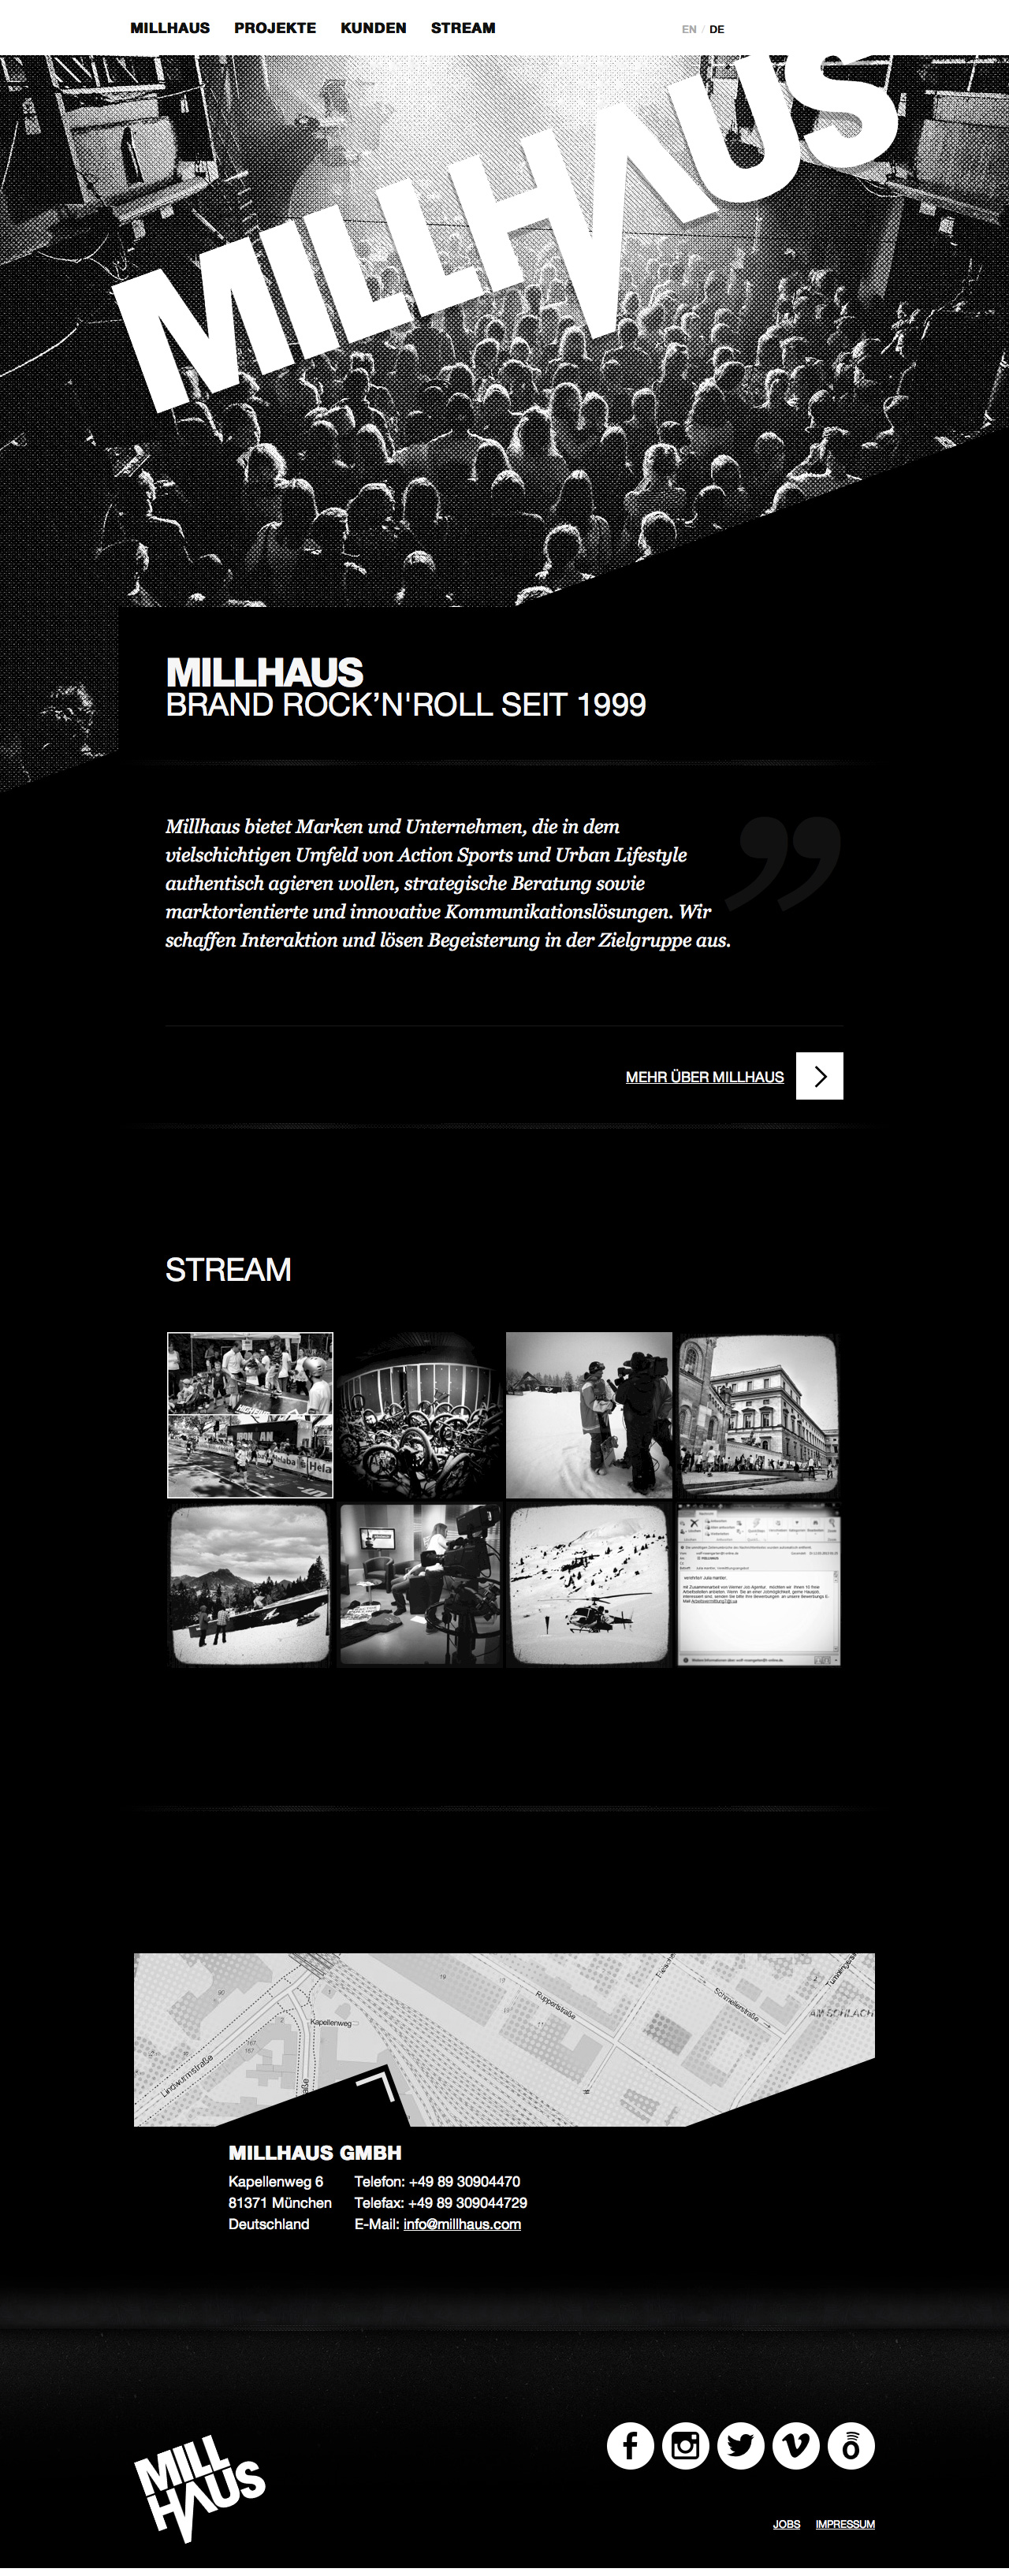 Millhaus 01 Image 01